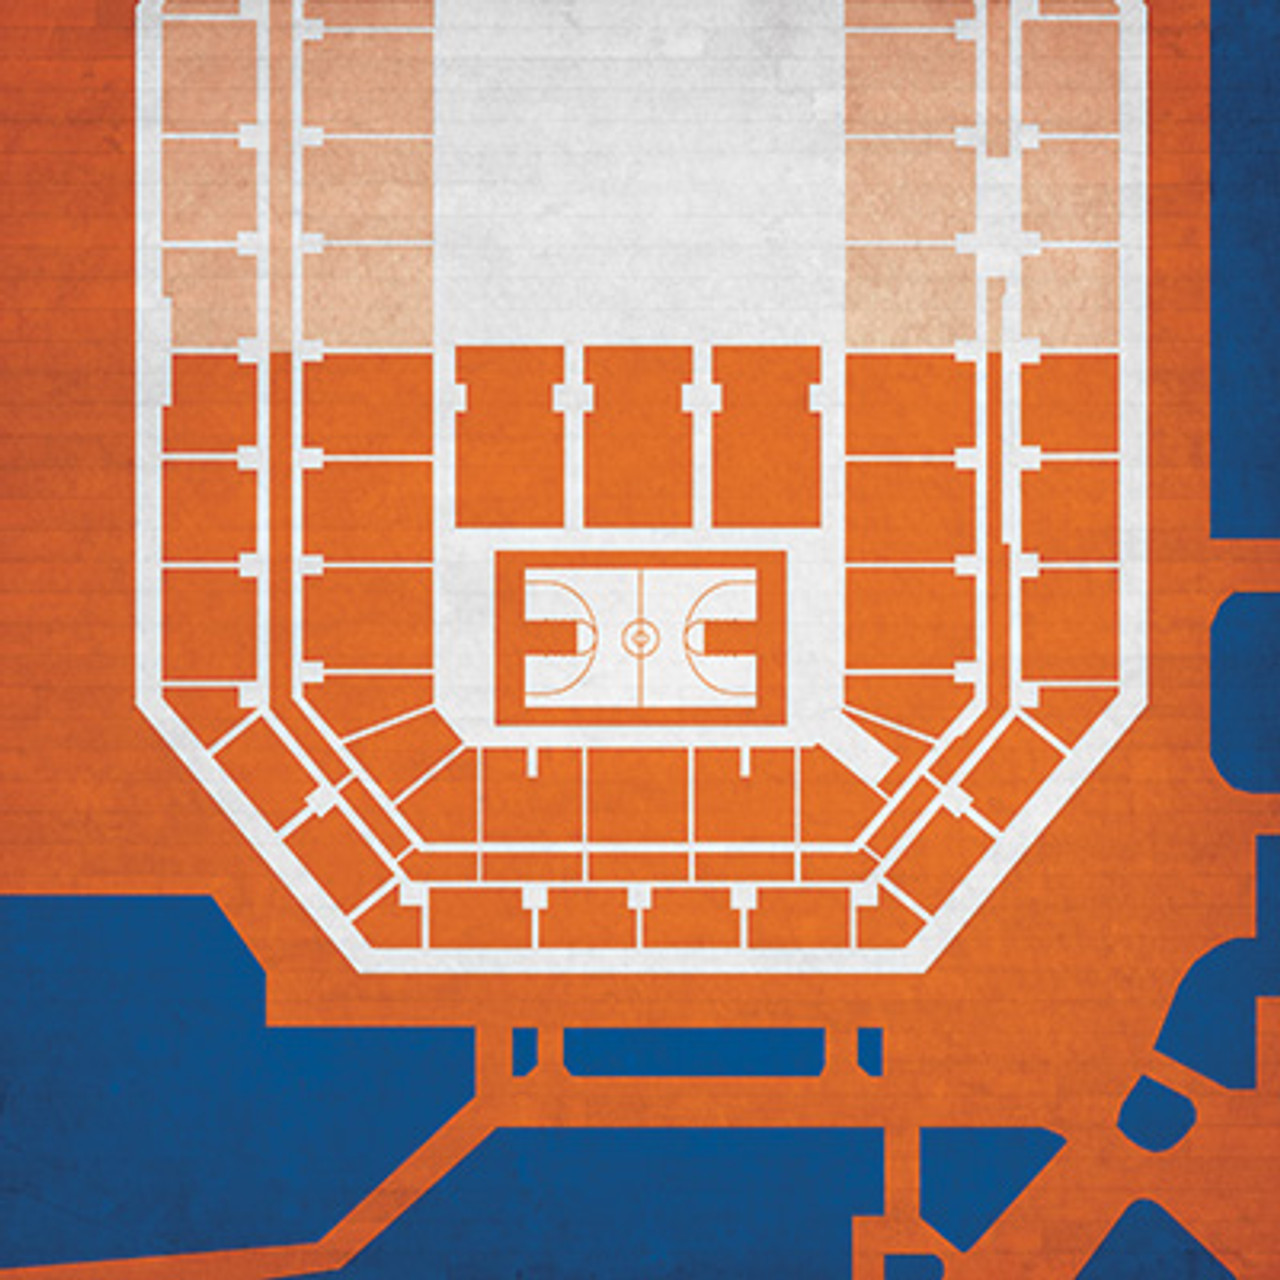 Syracuse Orange - Carrier Dome City Print